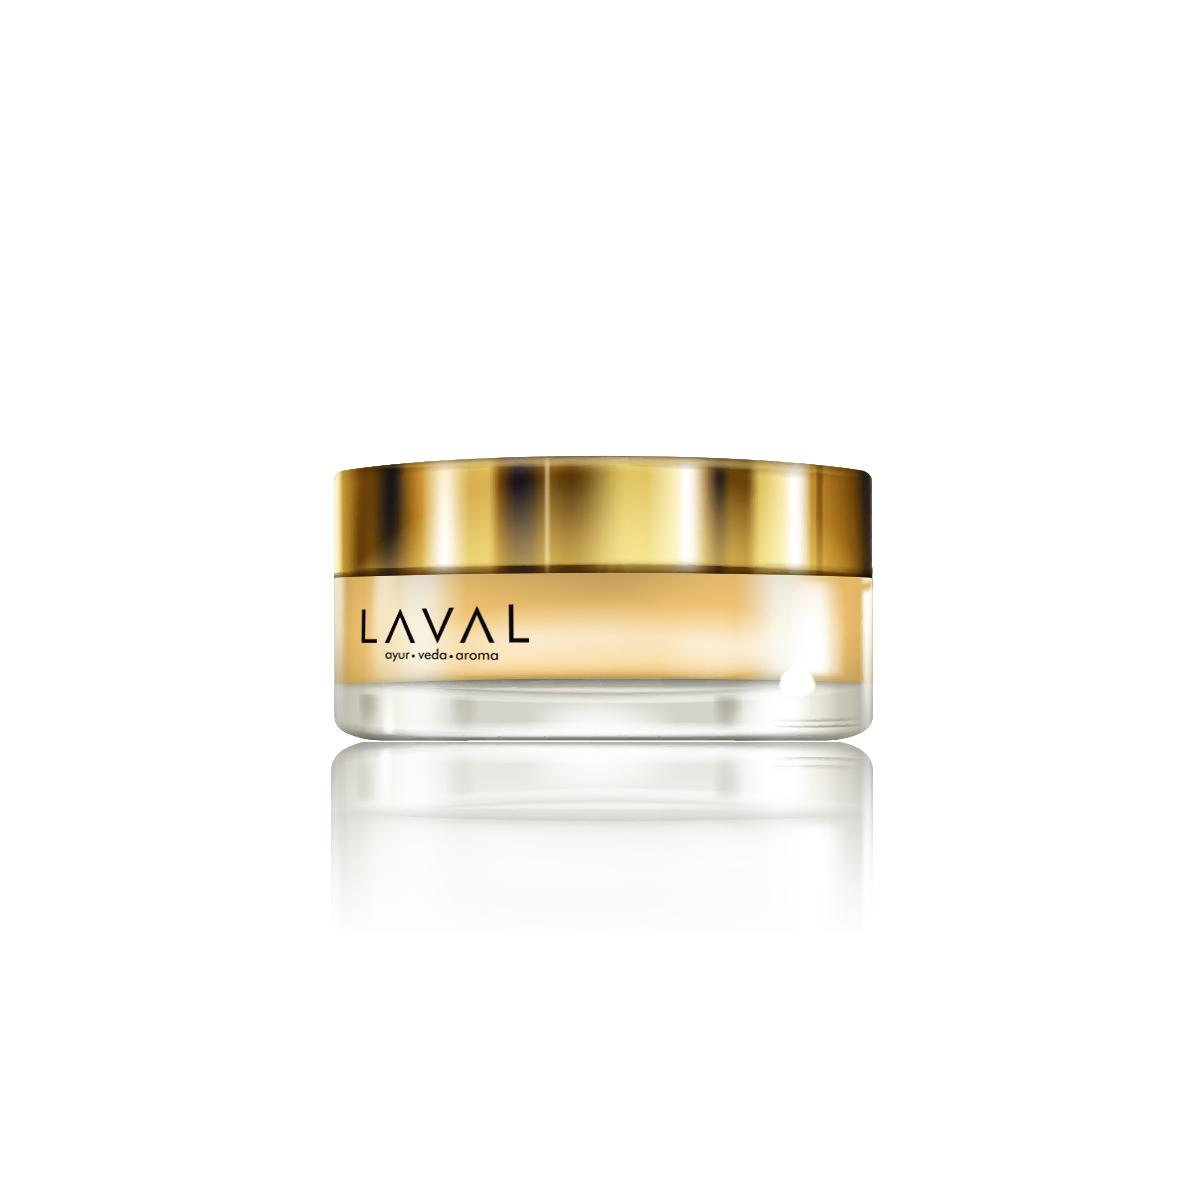 LAVAL | Deep Gorge-Radiance Lip Balm